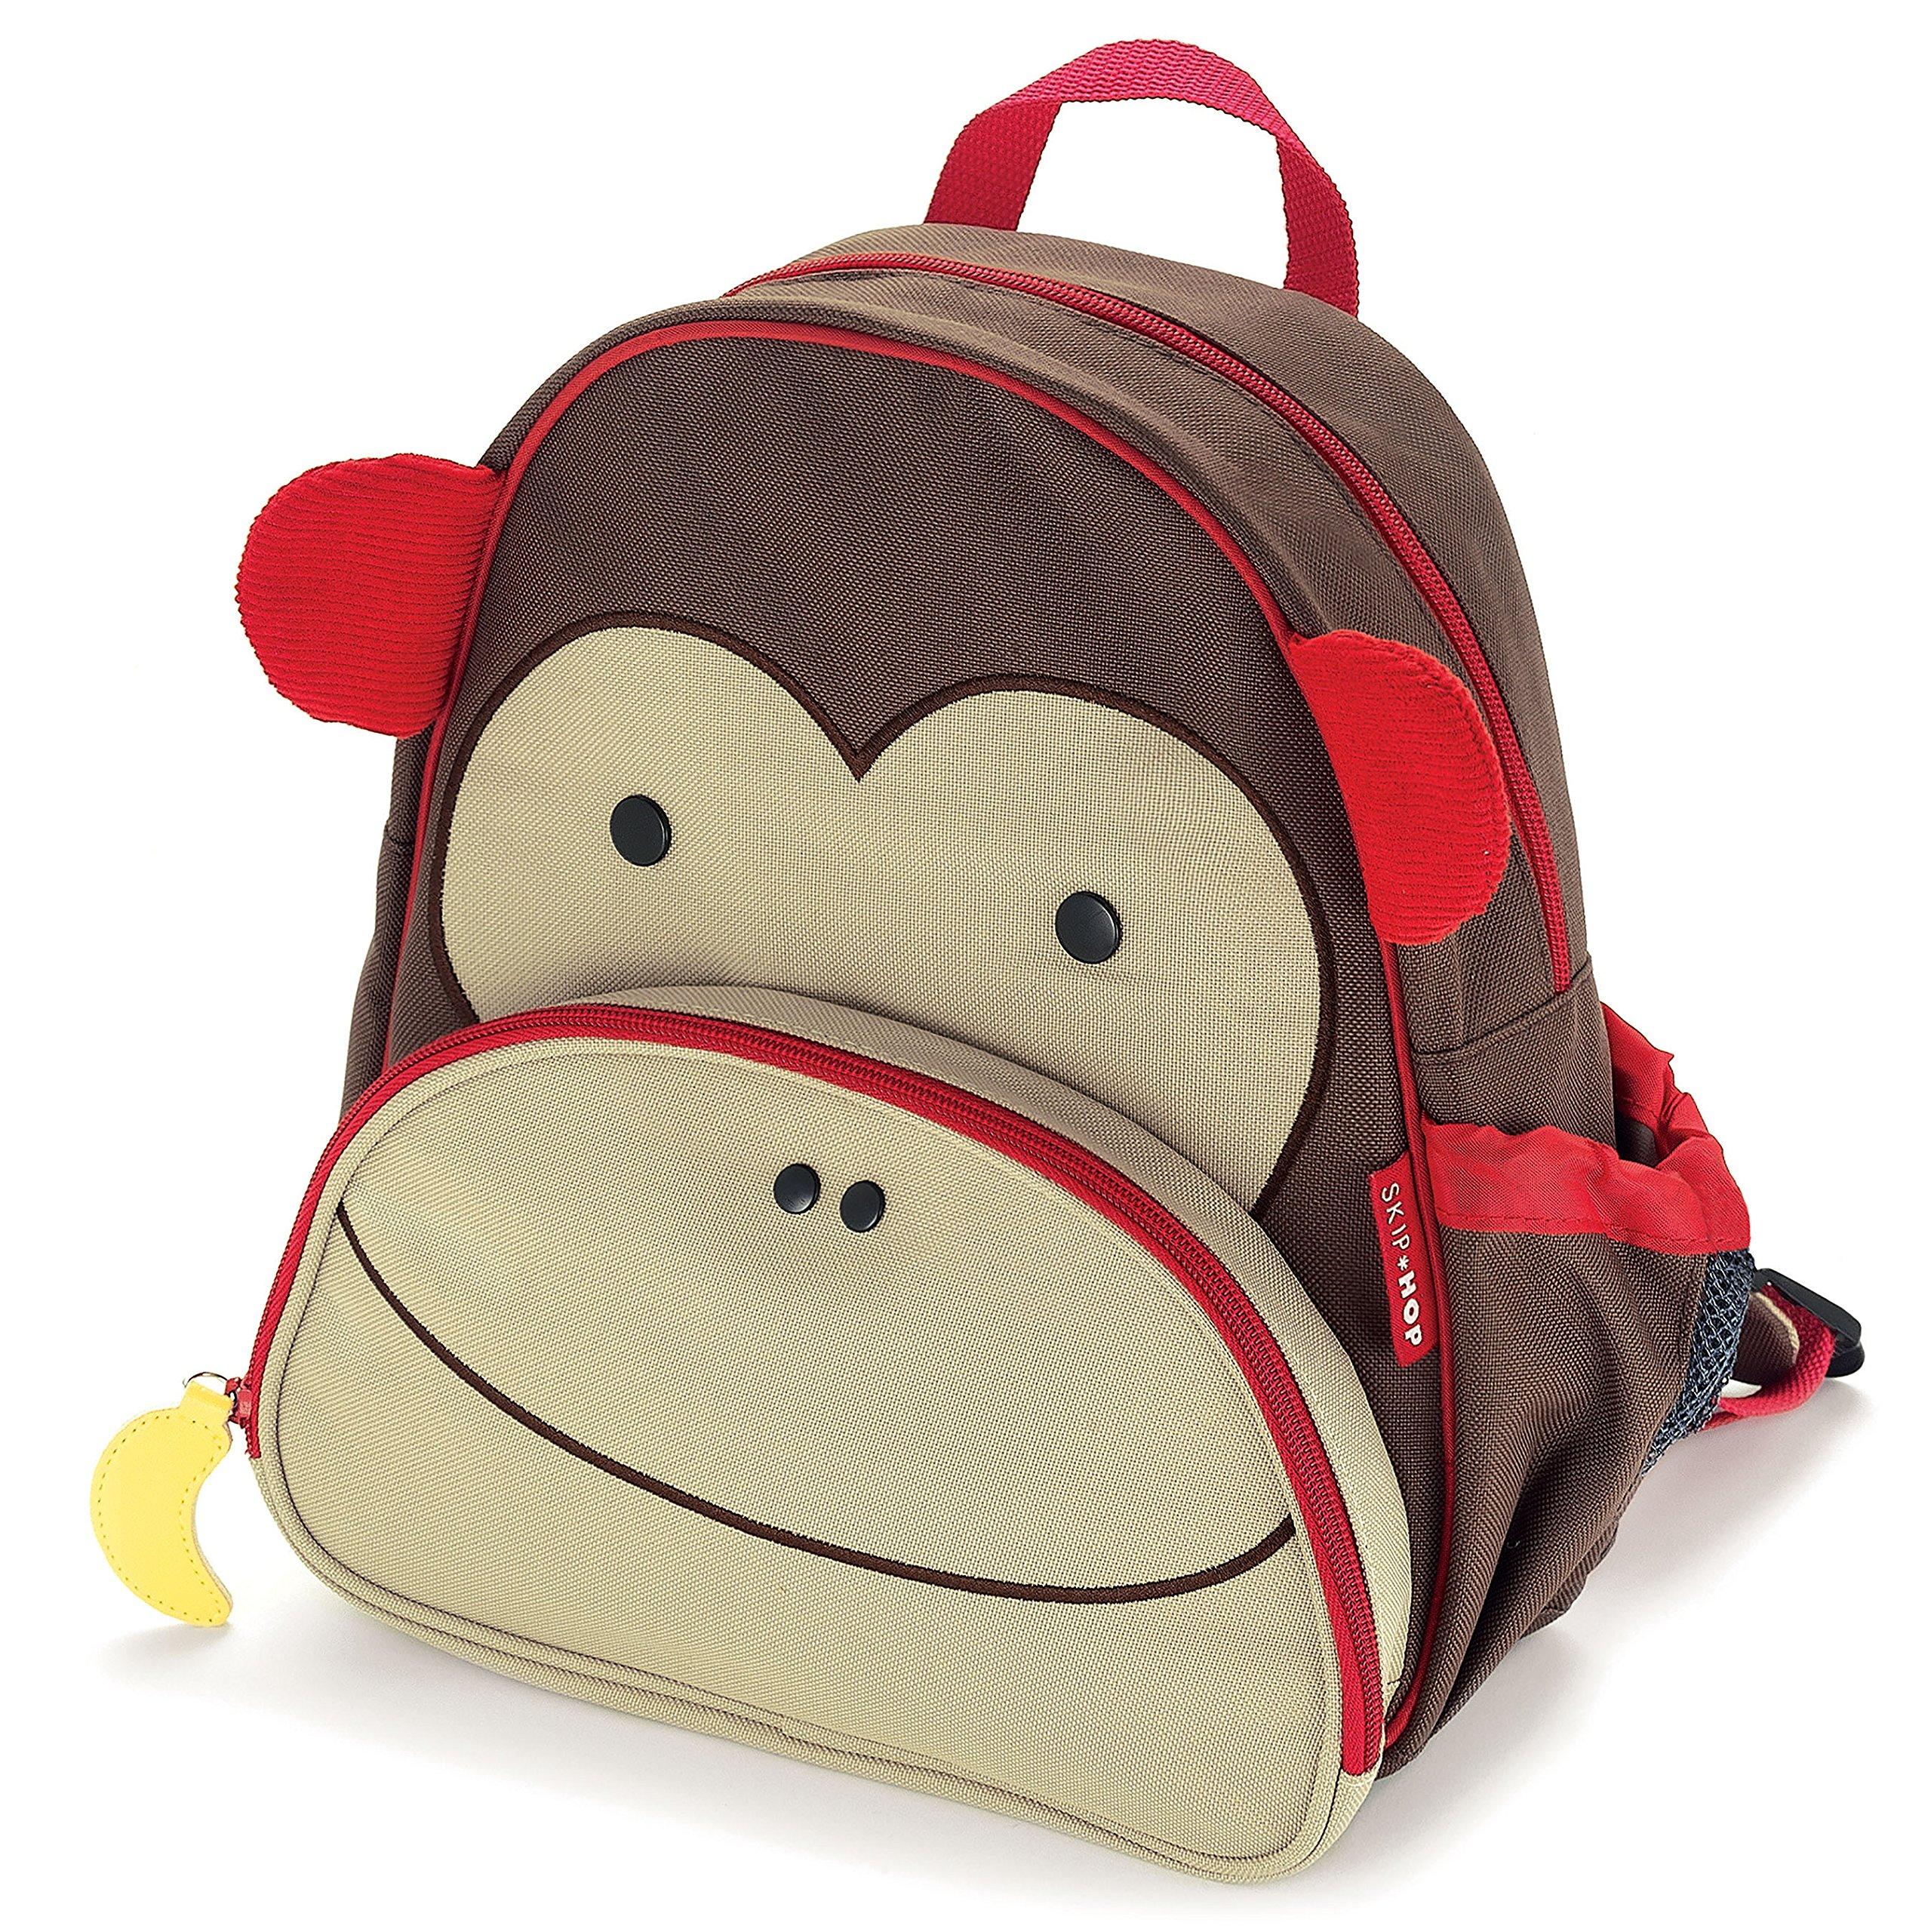 Zoo Toddler Backpack Marshall Monkey, 12'' School Bag, by Skip Hop (Image #2)